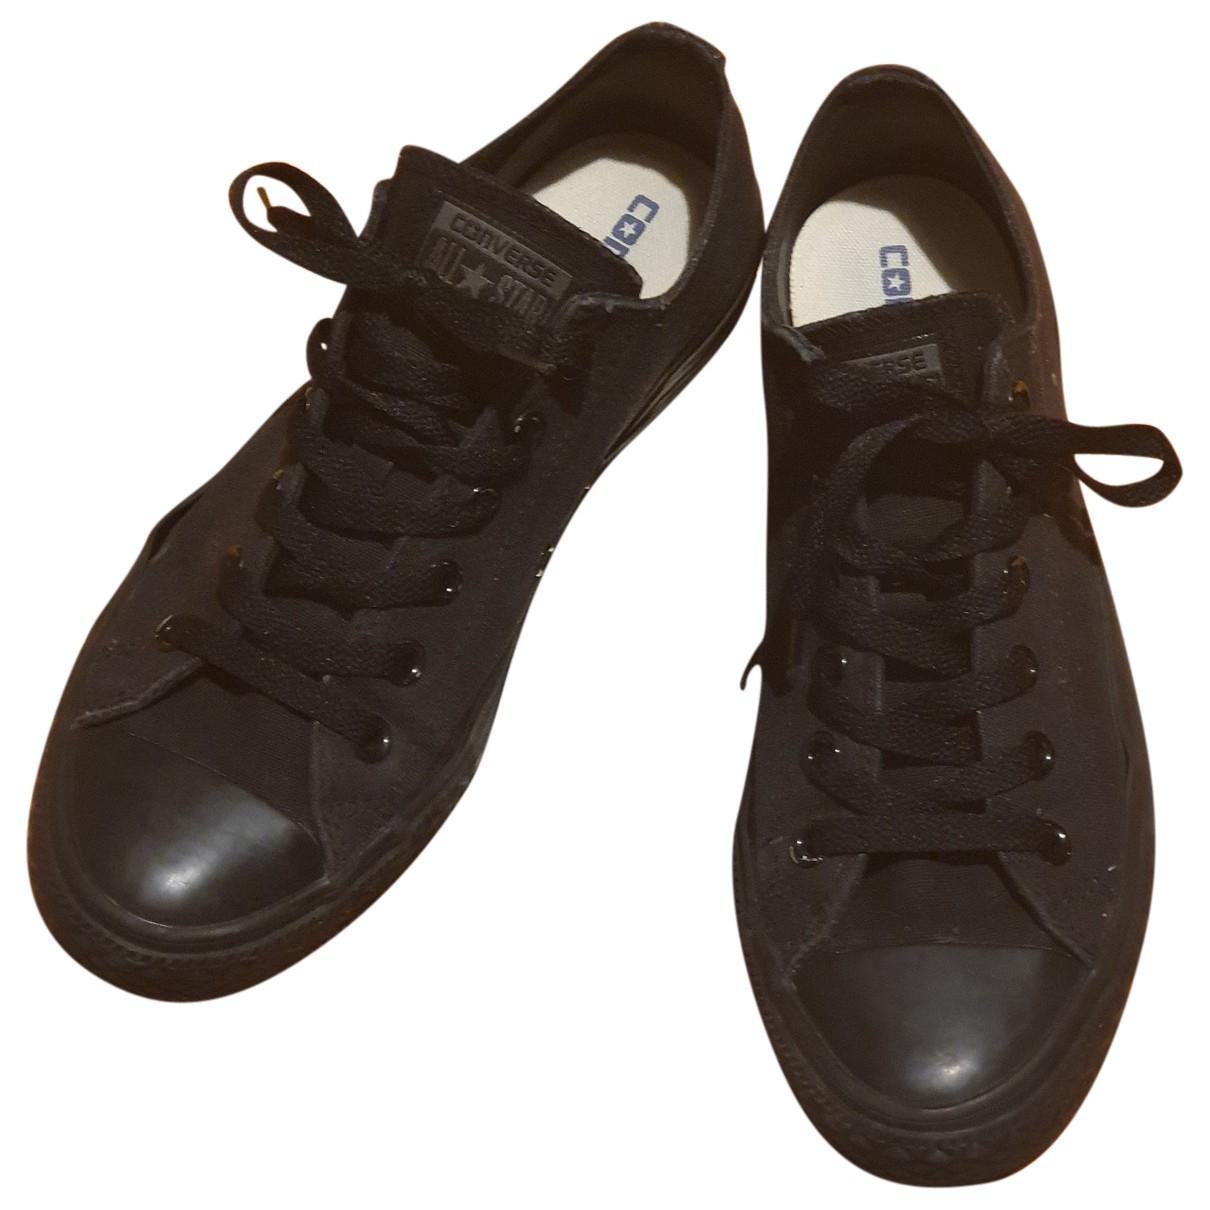 Converse N Black Cloth Trainers for Women 41 EU